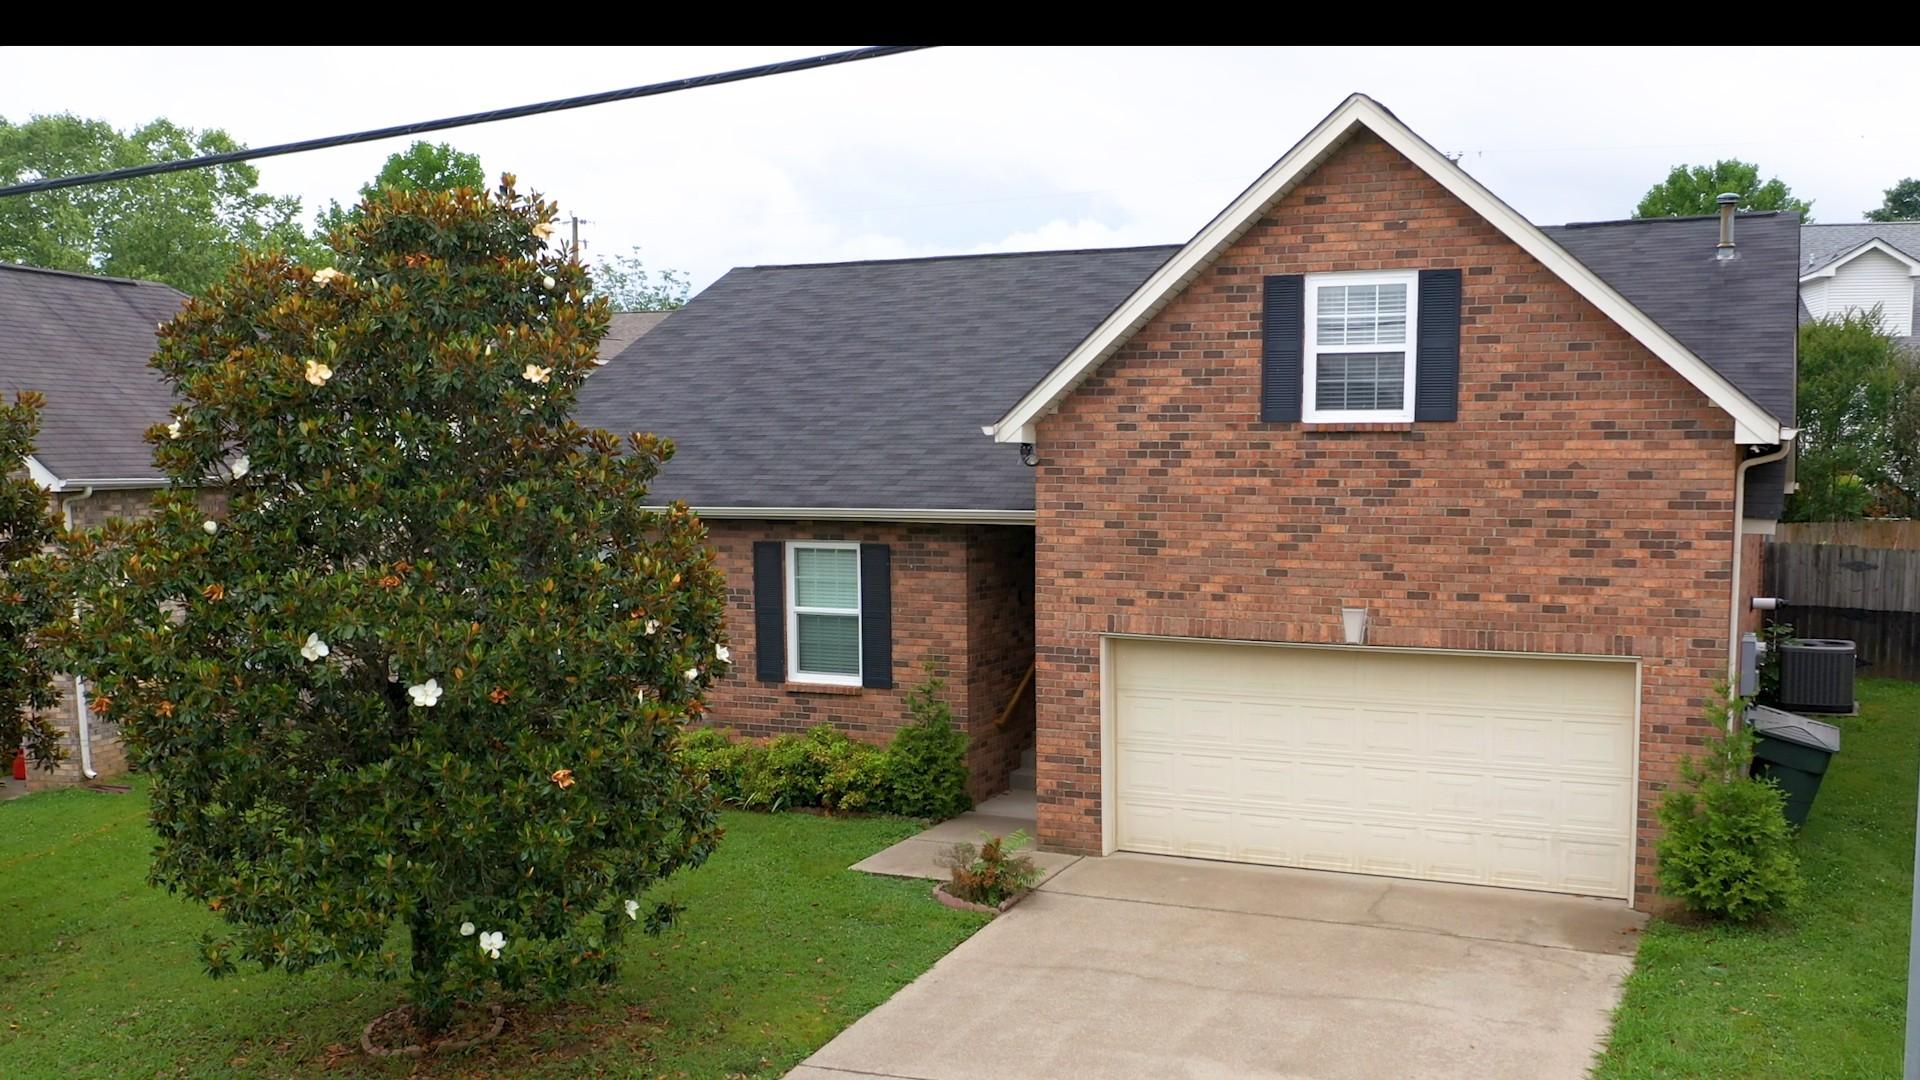 6944 Somerset Farms Cir Property Photo - Nashville, TN real estate listing